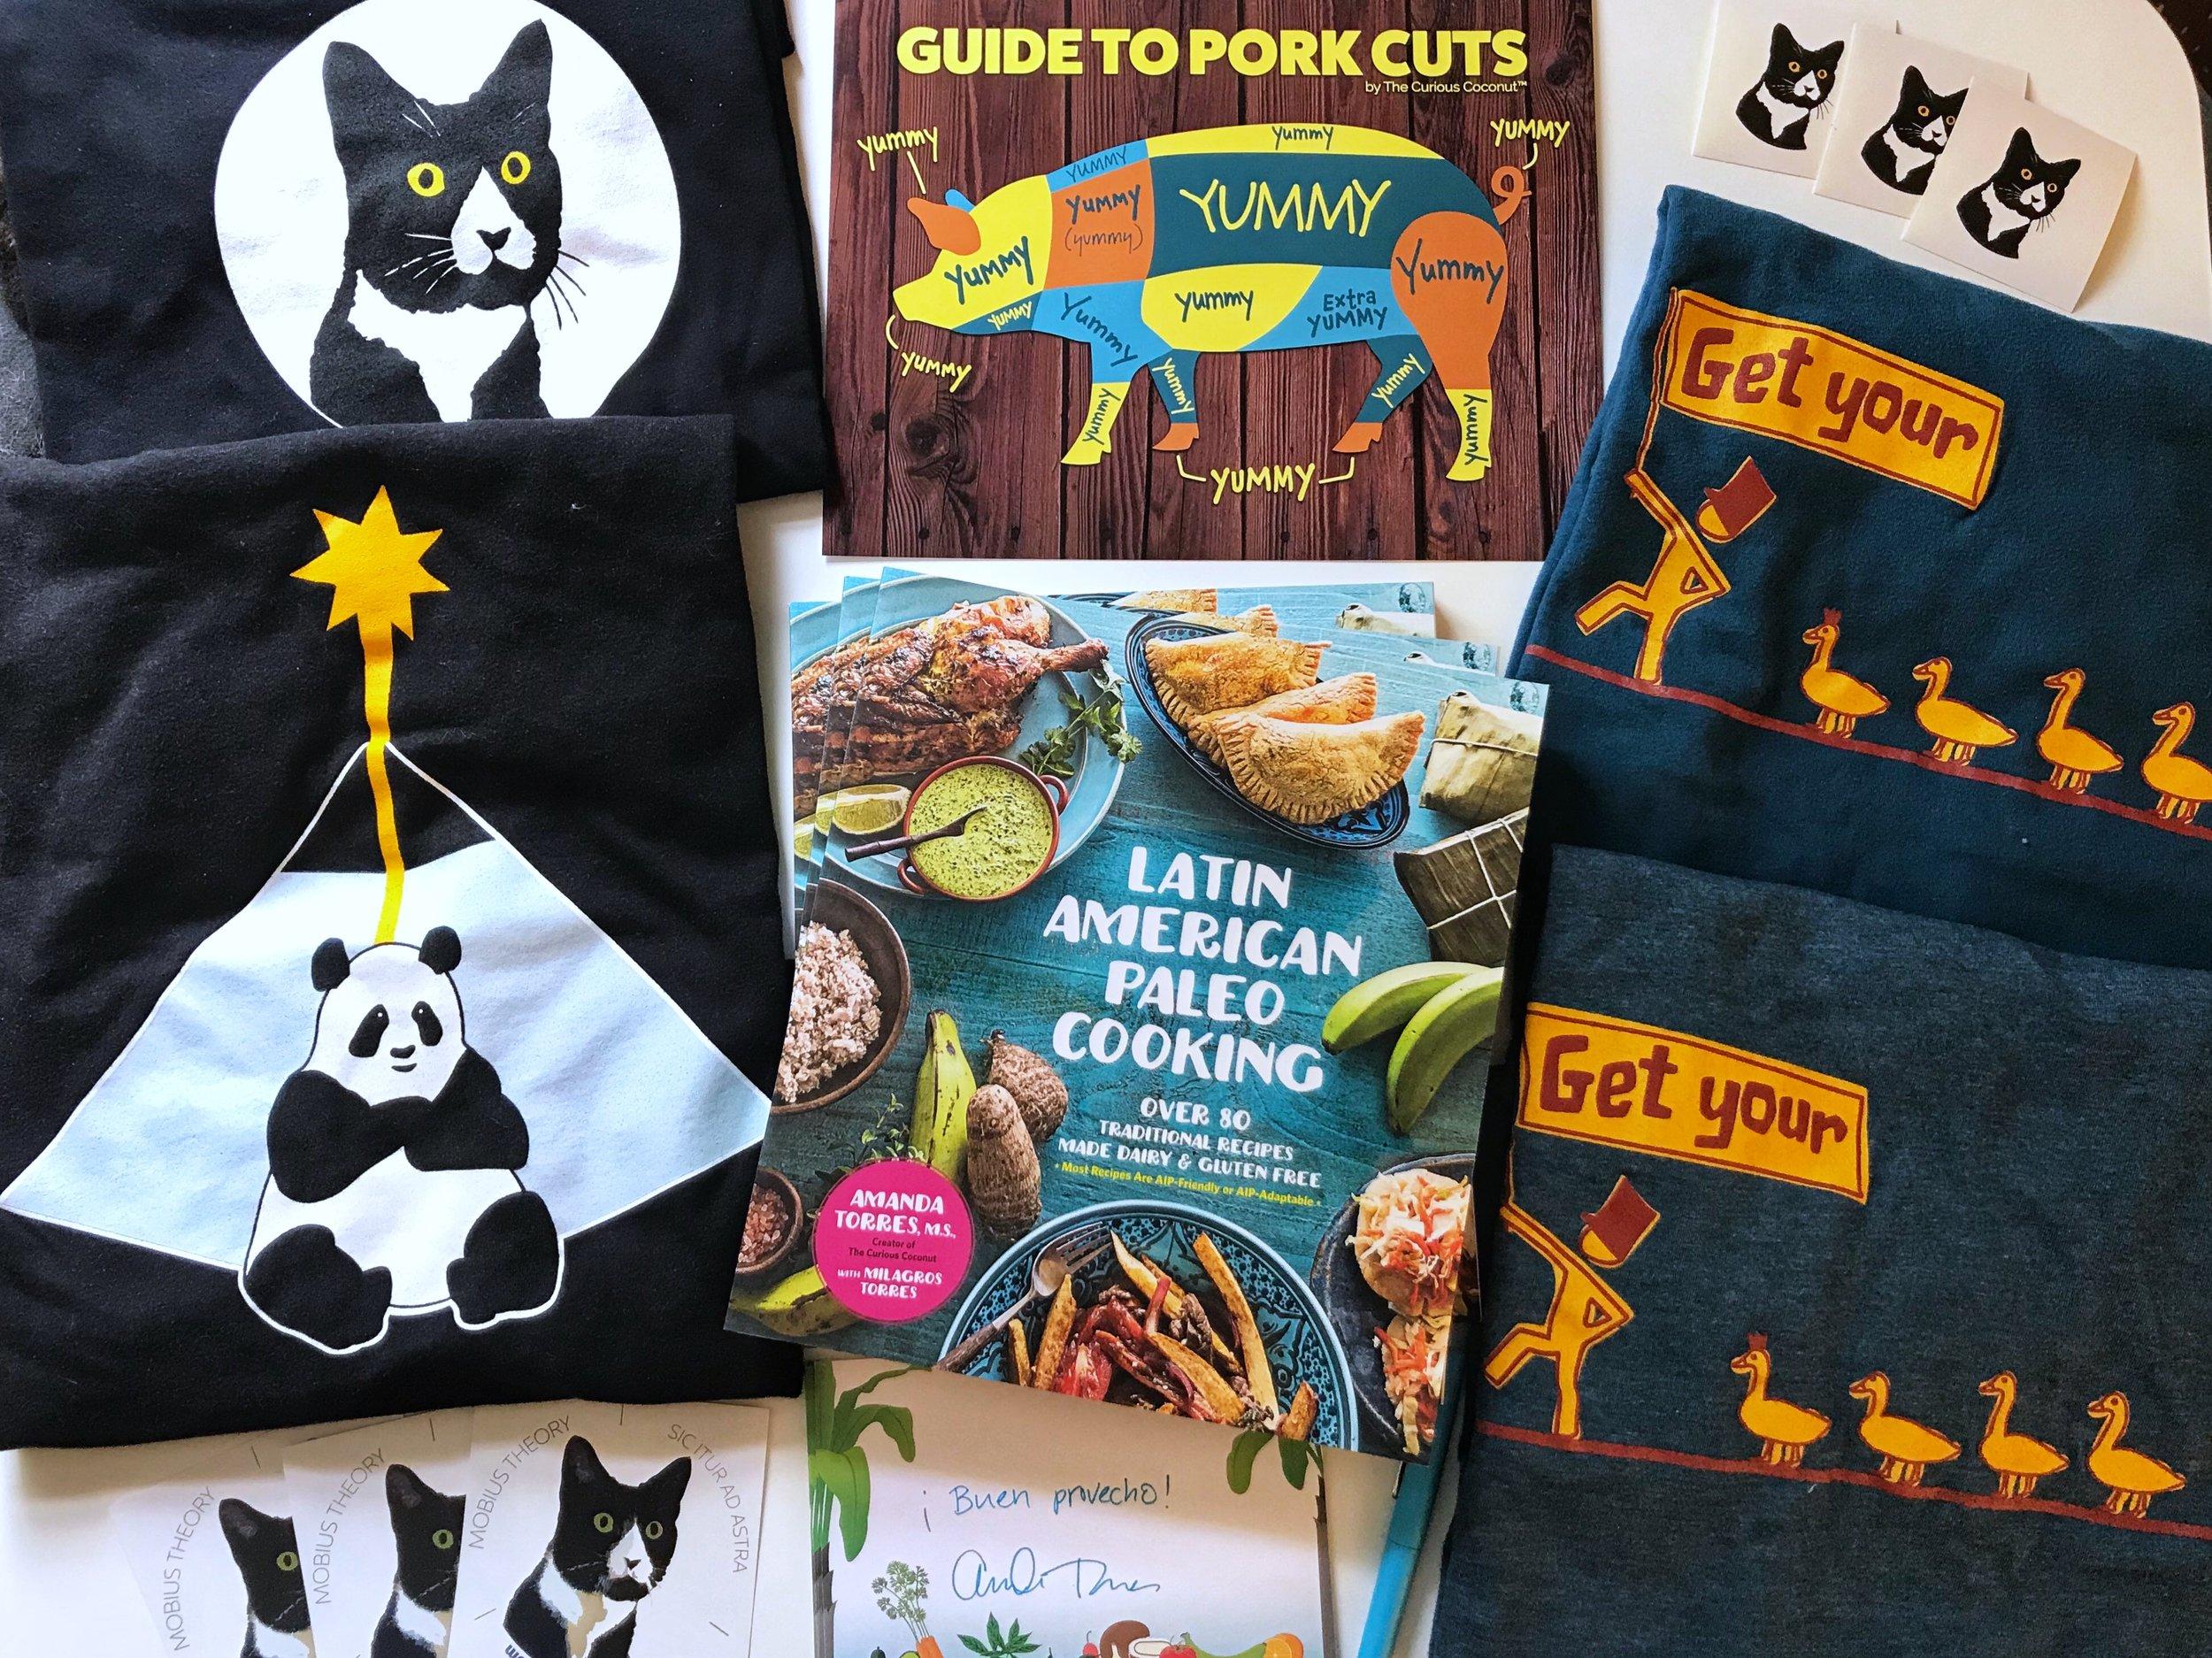 latin american paleo cooking 1 year giveaway